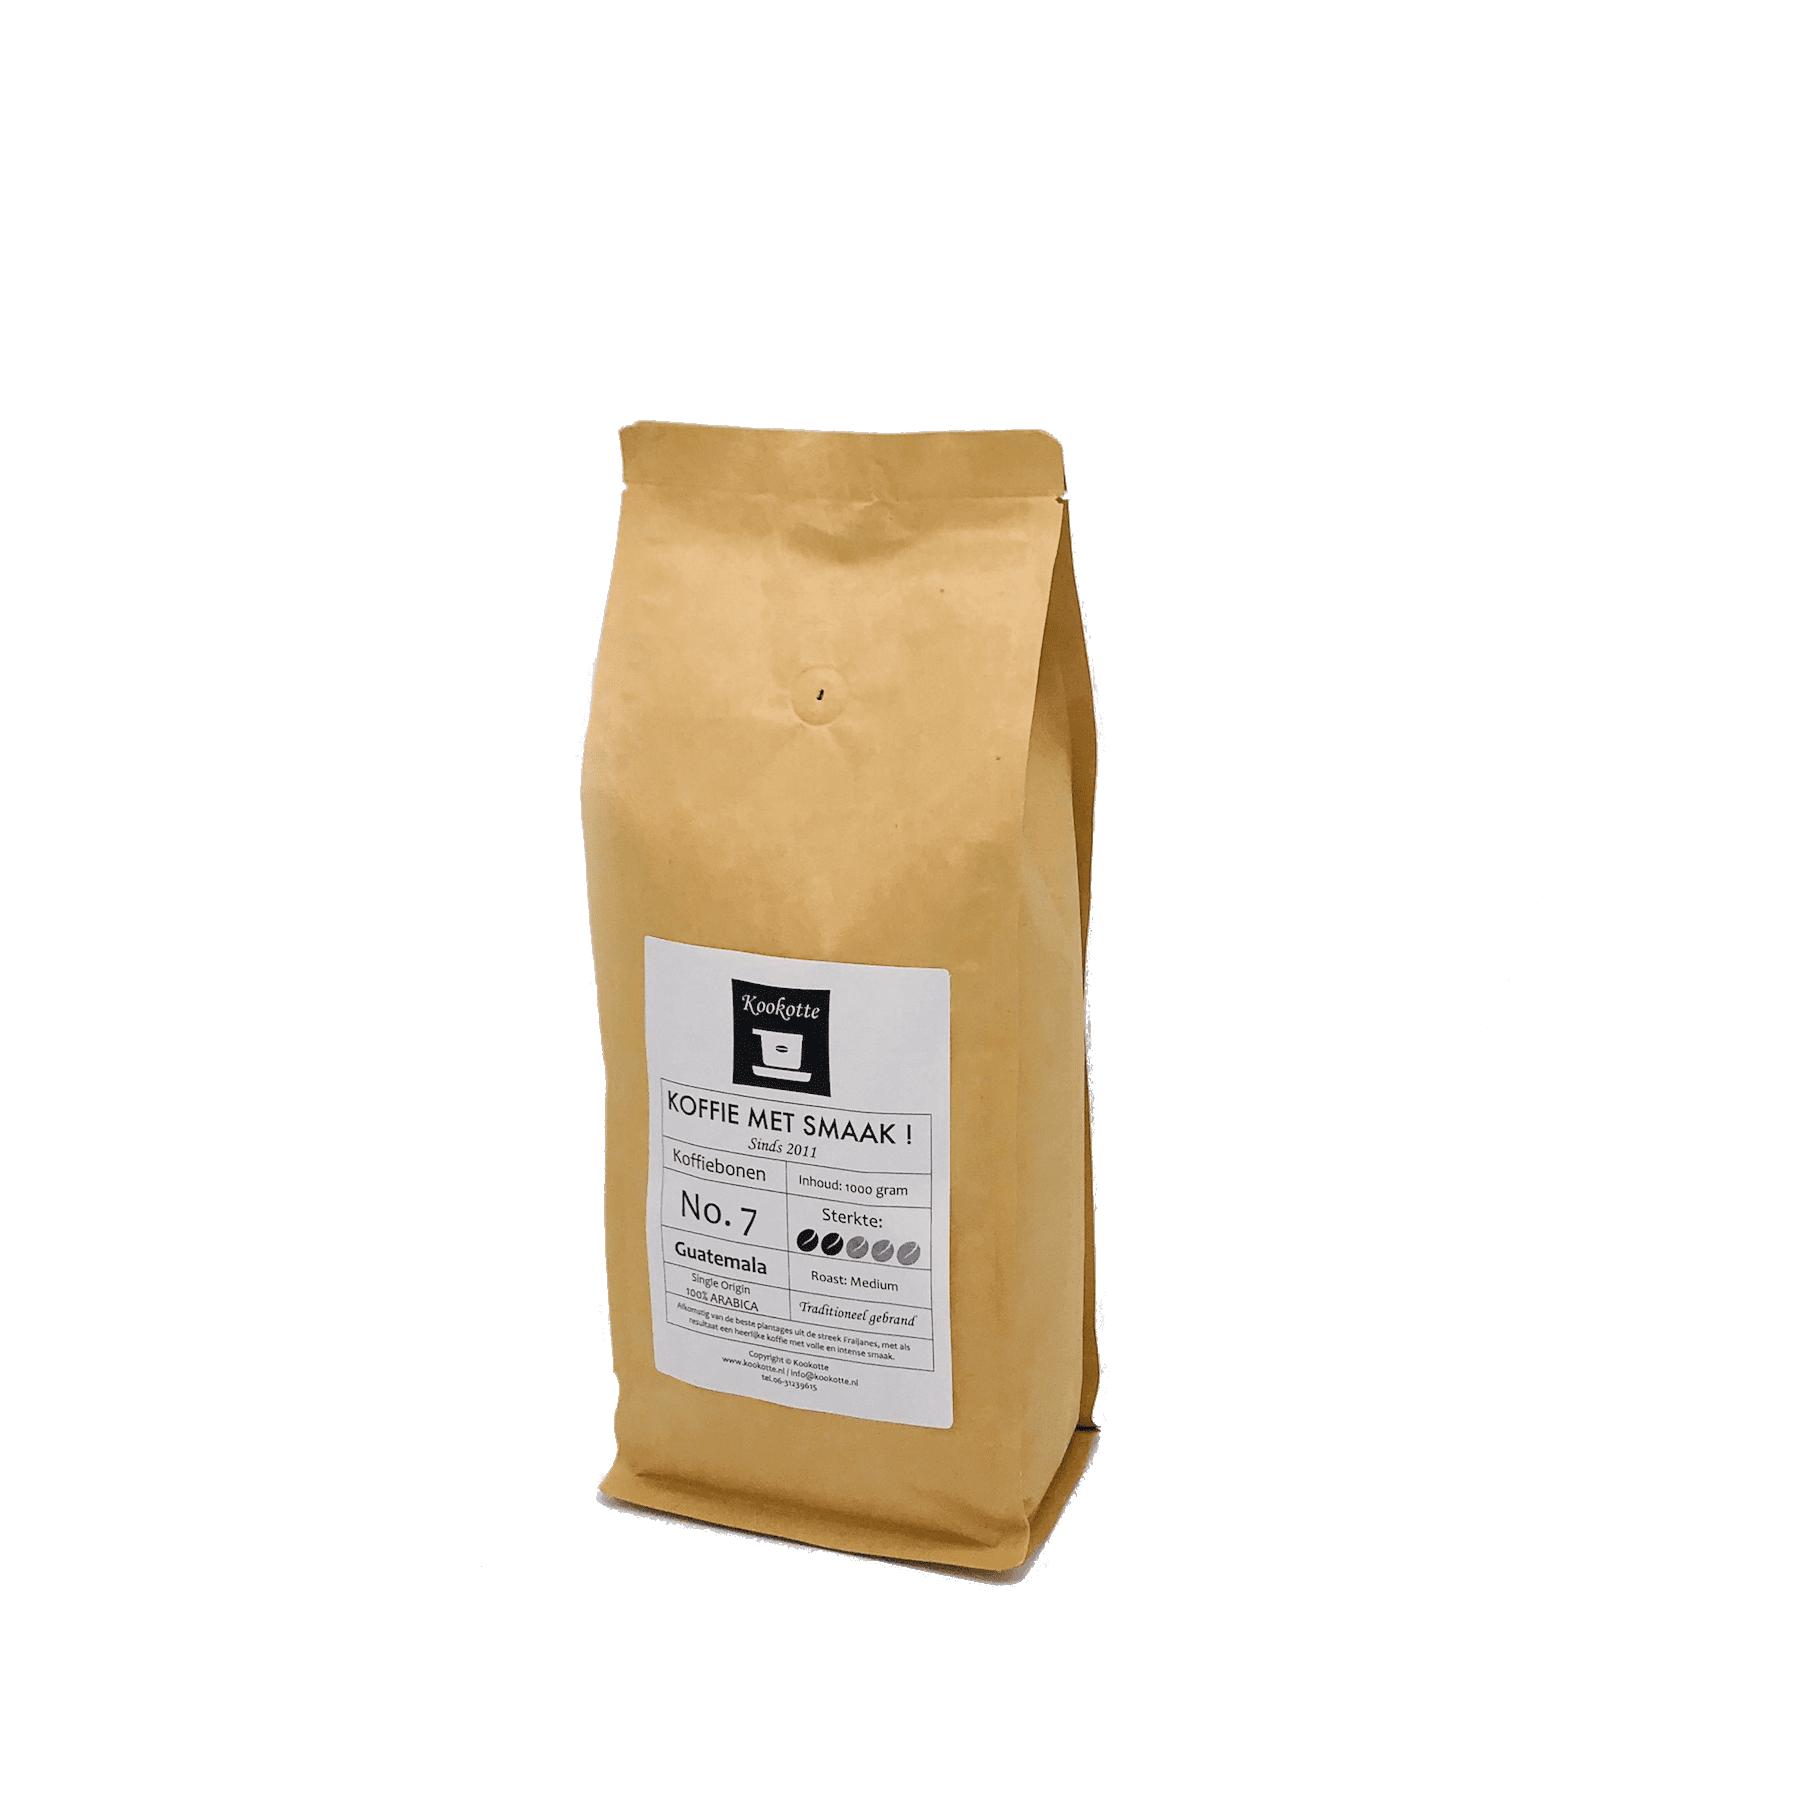 Koffiebonen No.7